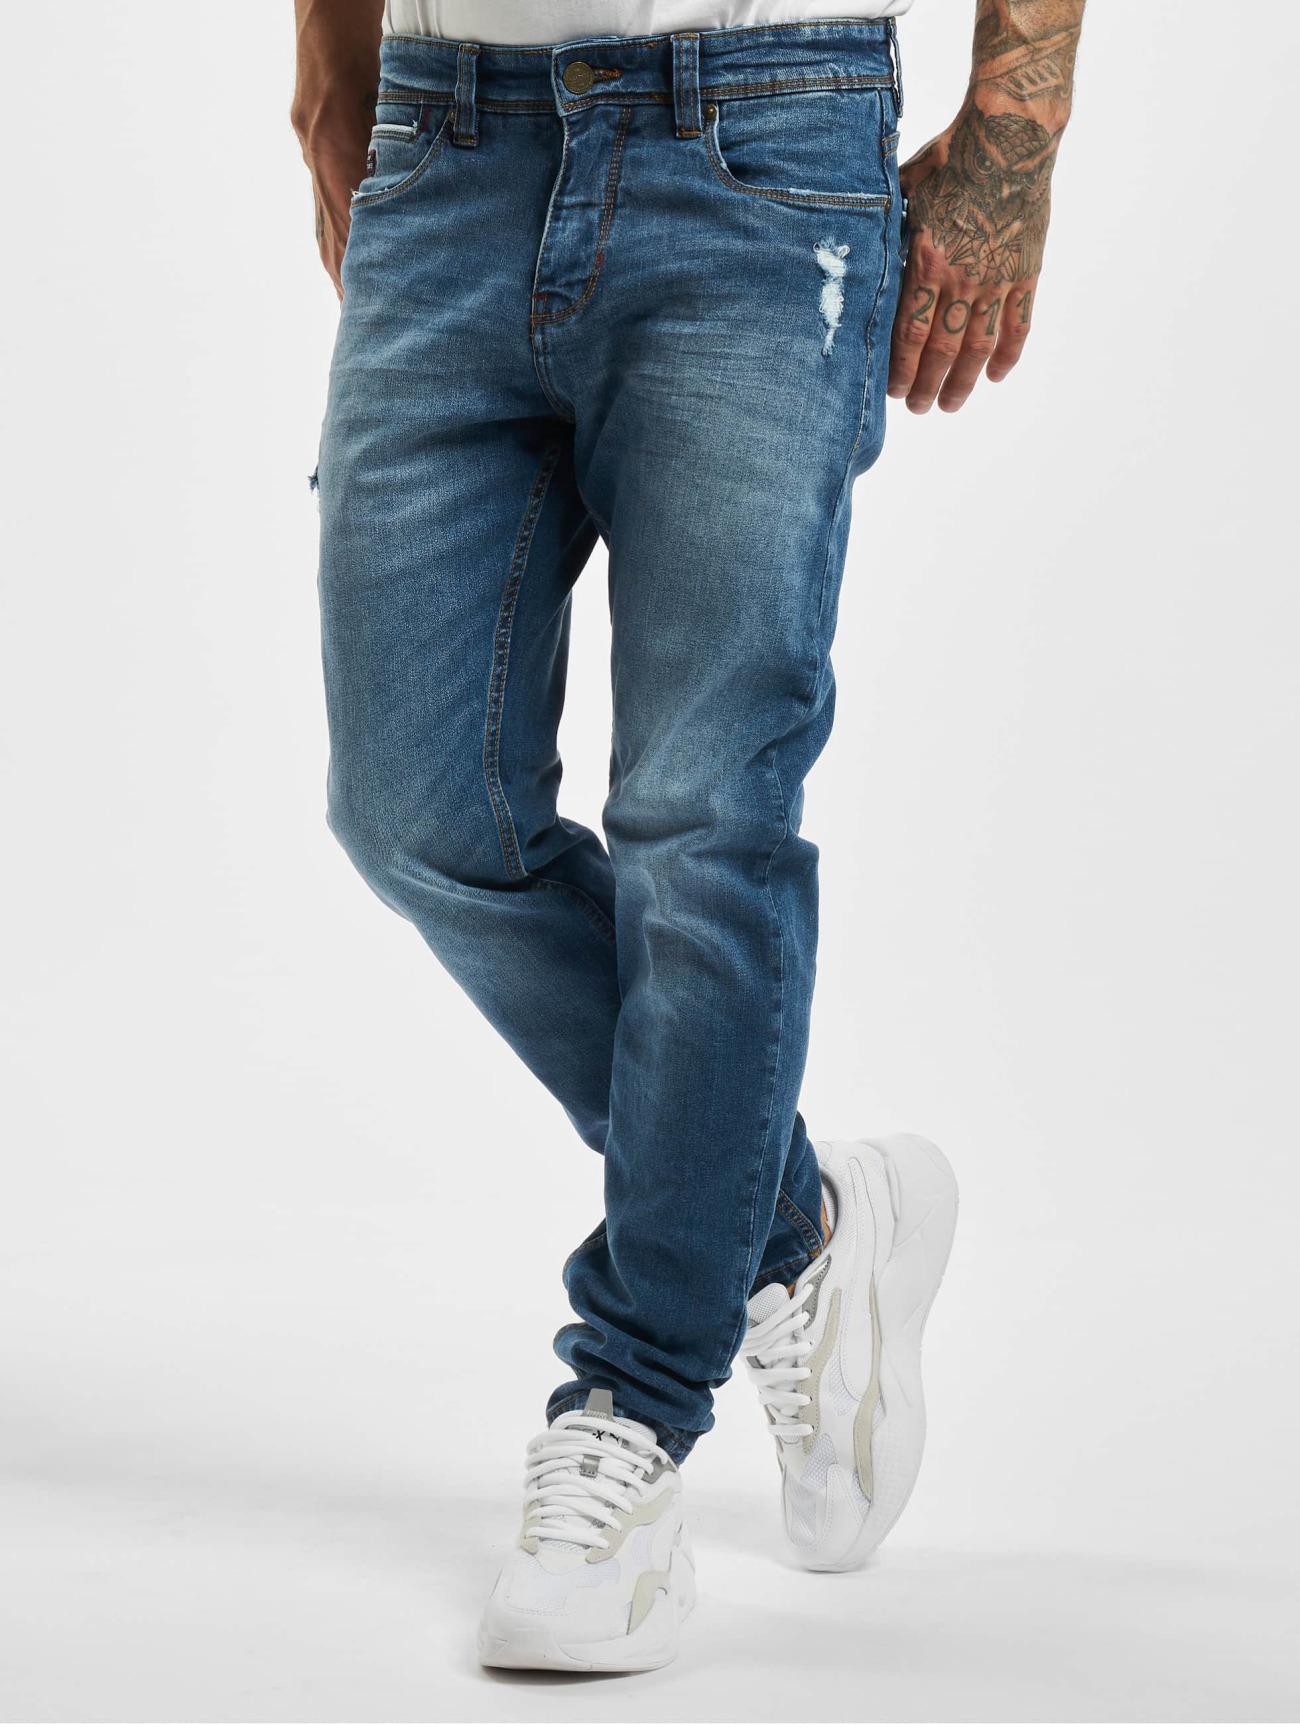 Sublevel  Loys   bleu Homme Jean slim  774702 Homme Jeans